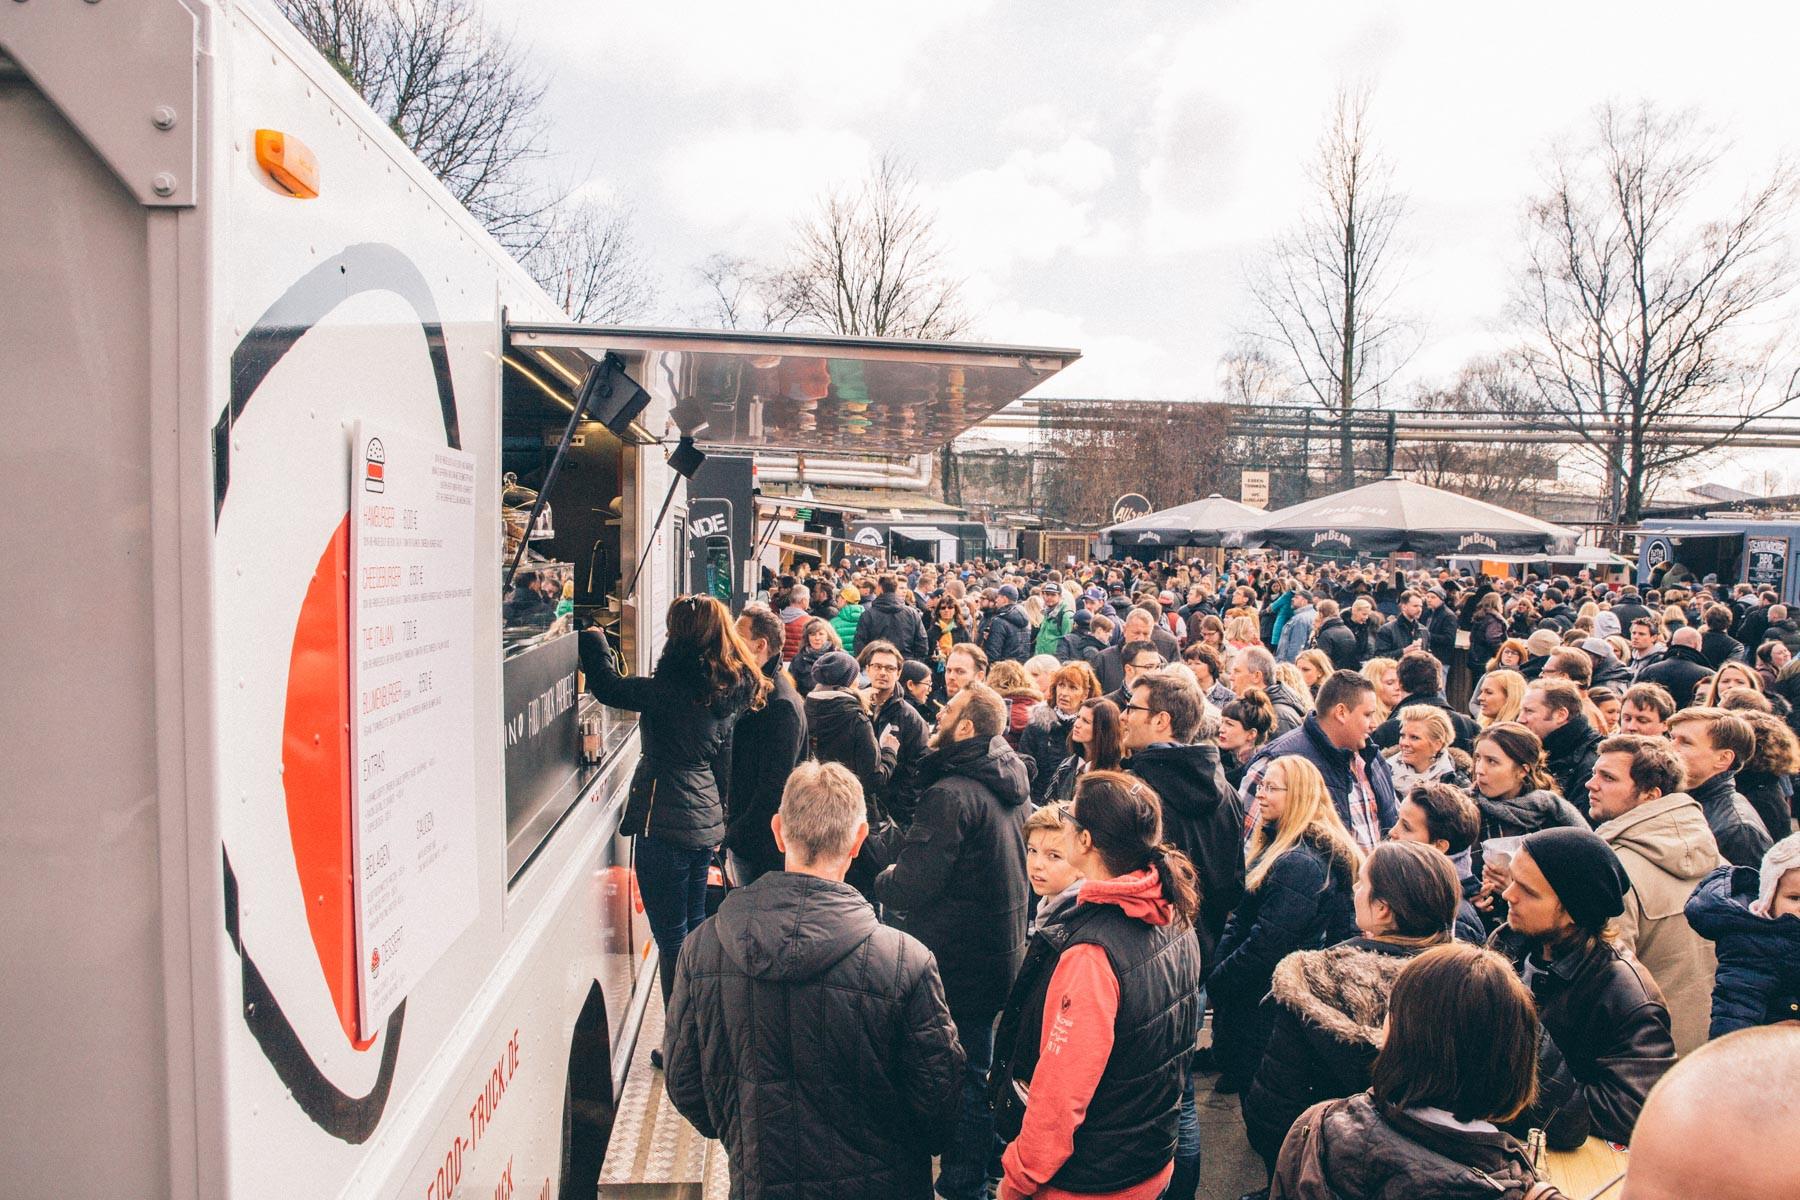 Food Truck Catering für 200 Personen